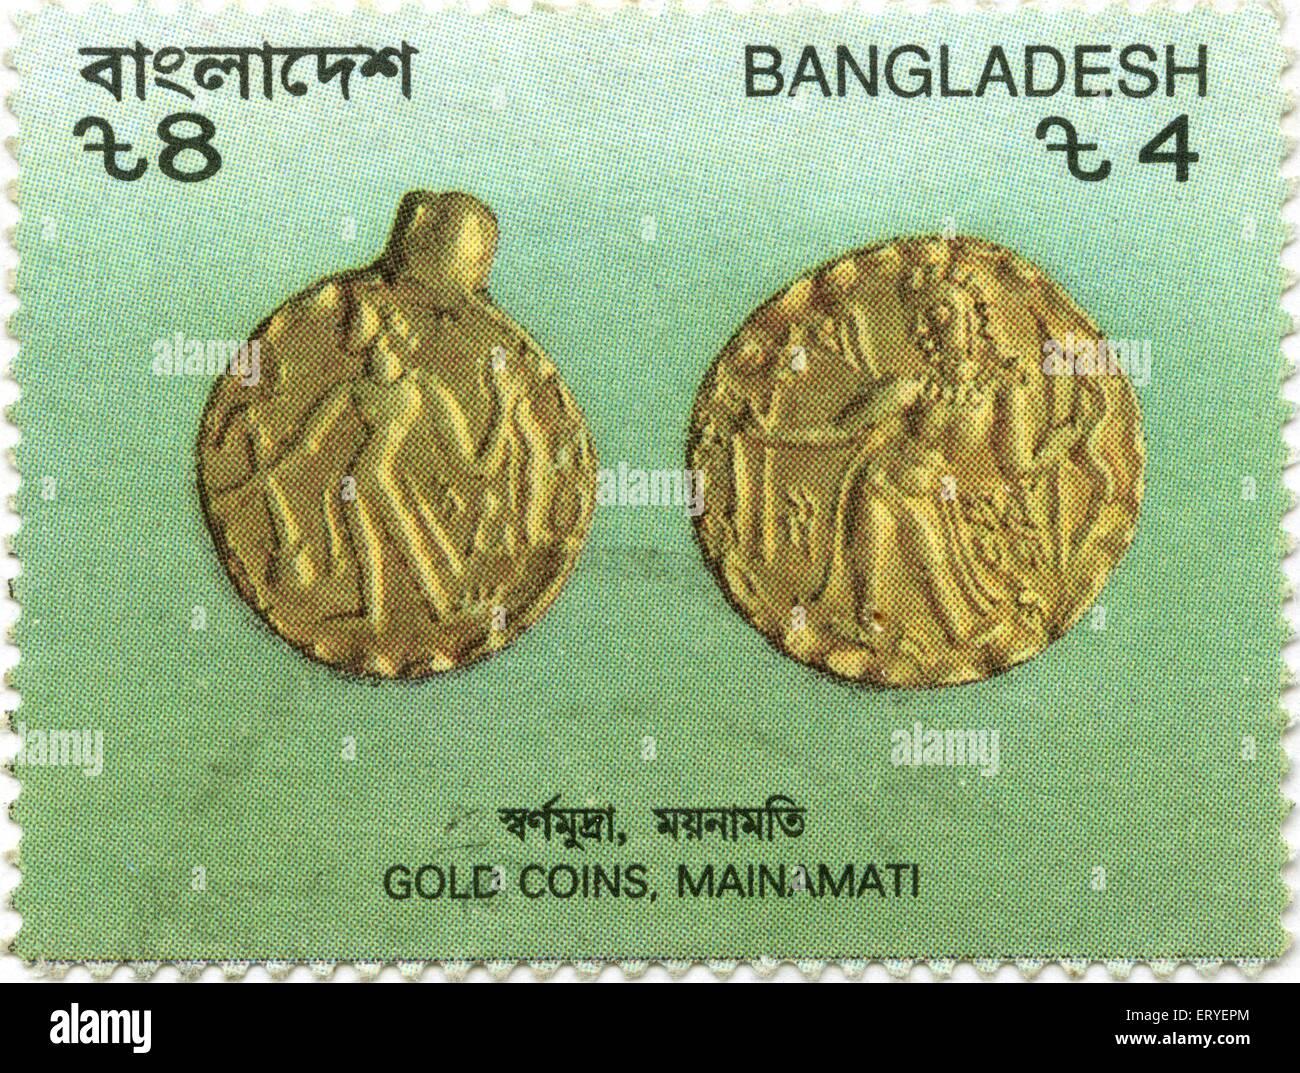 Postal stamp of gold coins ; Mainamati ; Bangladesh - Stock Image